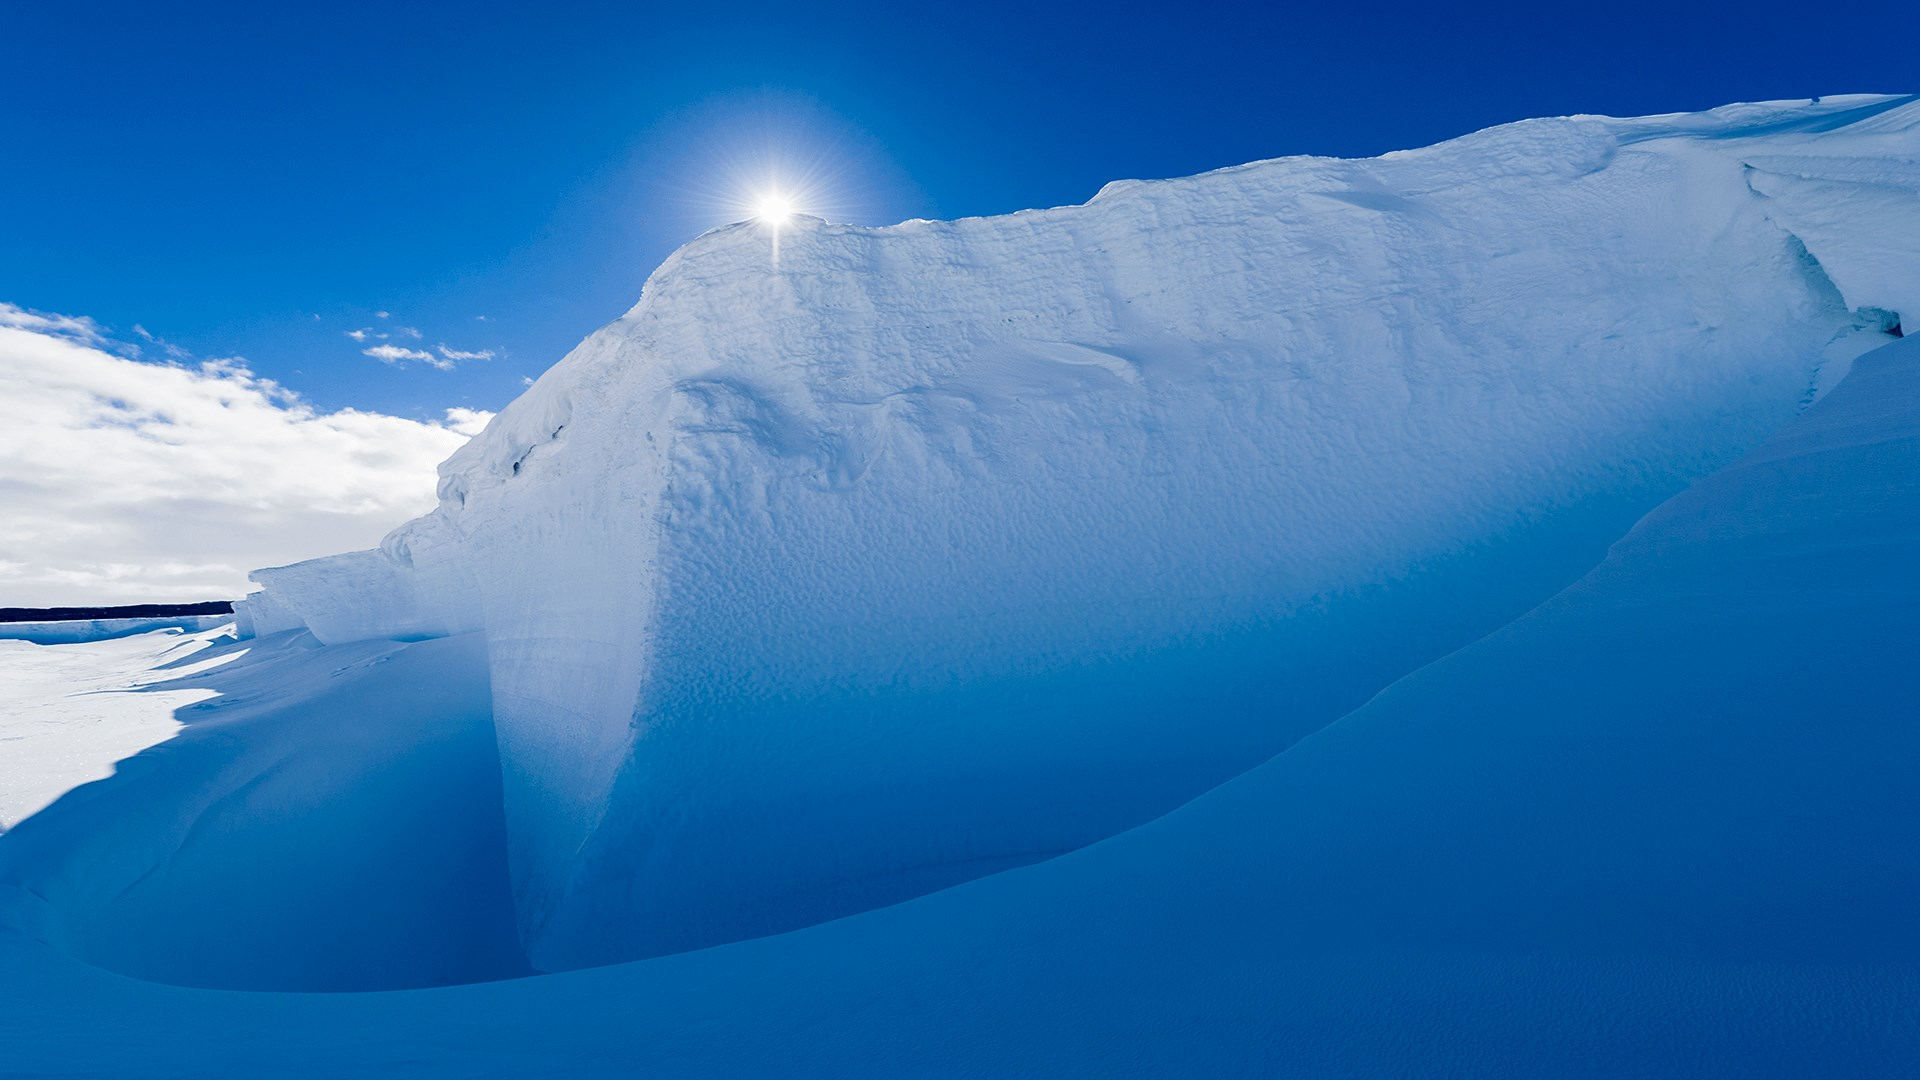 Windows10テーマ National Geographic Antarctica Premium が配信 Wpteq